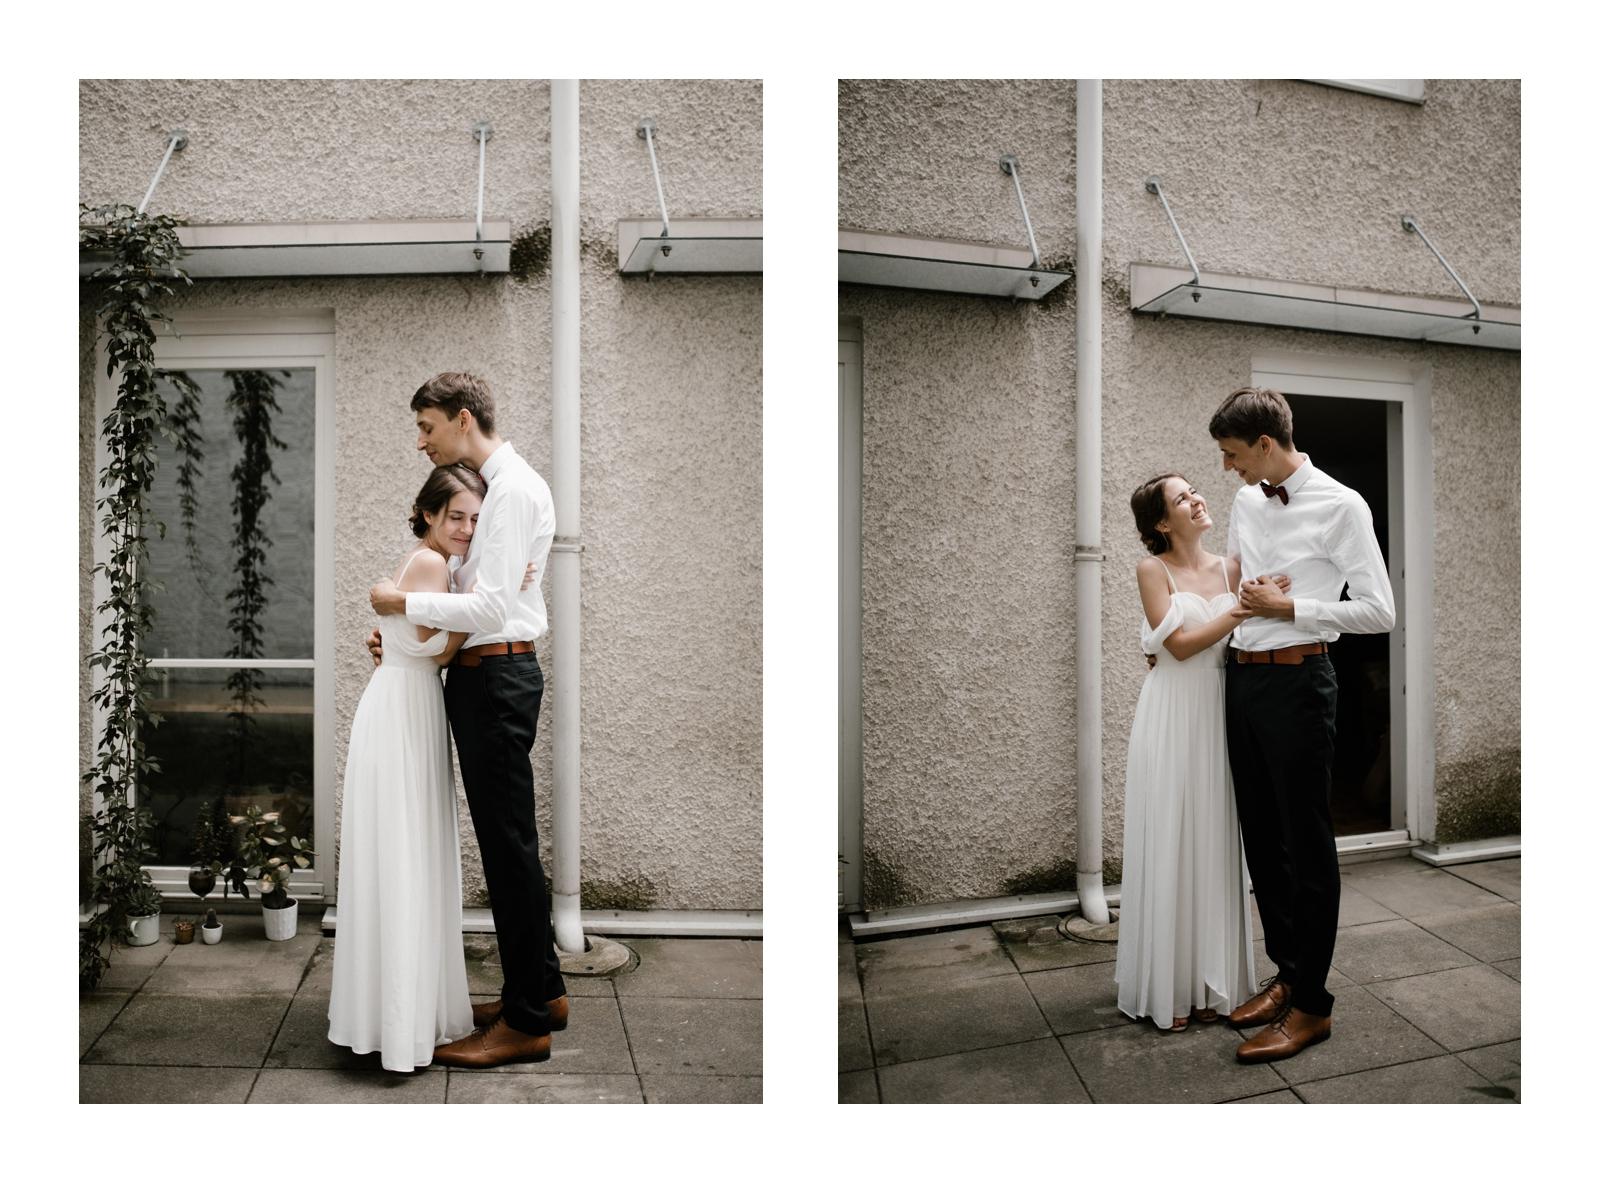 mirjam_thomas_wedding-103.jpg